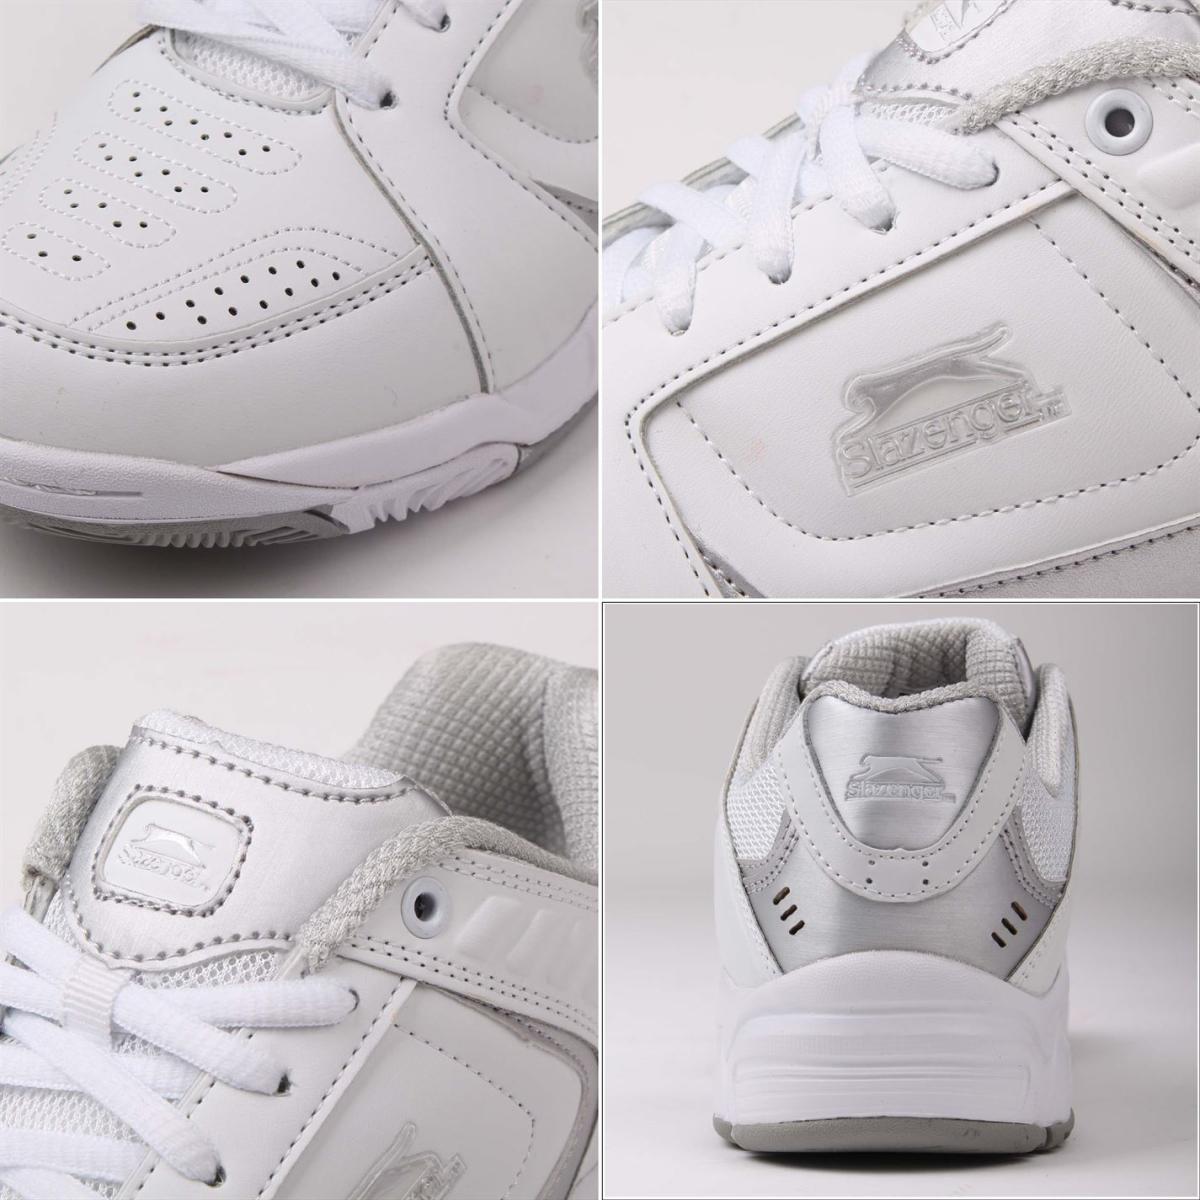 Slazenger-Turnschuhe-Laufschuhe-Damen-Sportschuhe-Sneakers-Lifestyle-6118 Indexbild 7